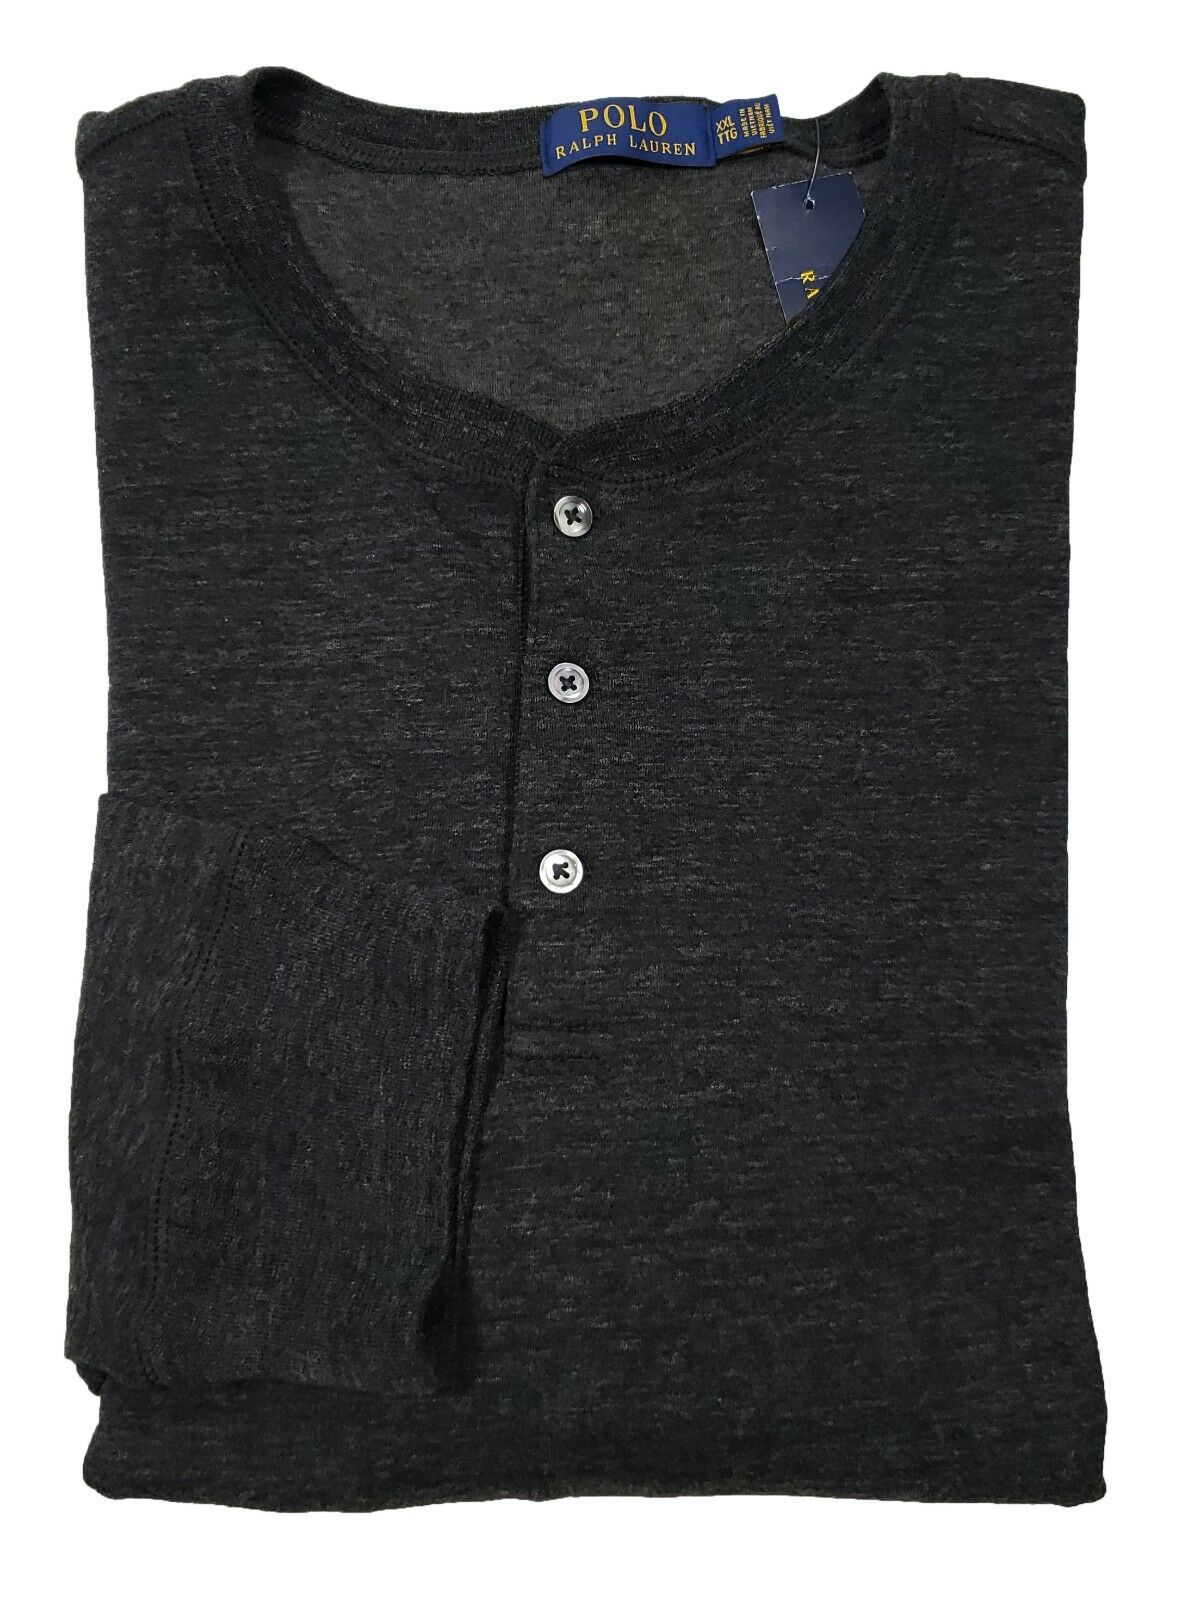 Polo Ralph Lauren Men's Marl Grey Duo-Fold Long Sleeve Henley Shirt